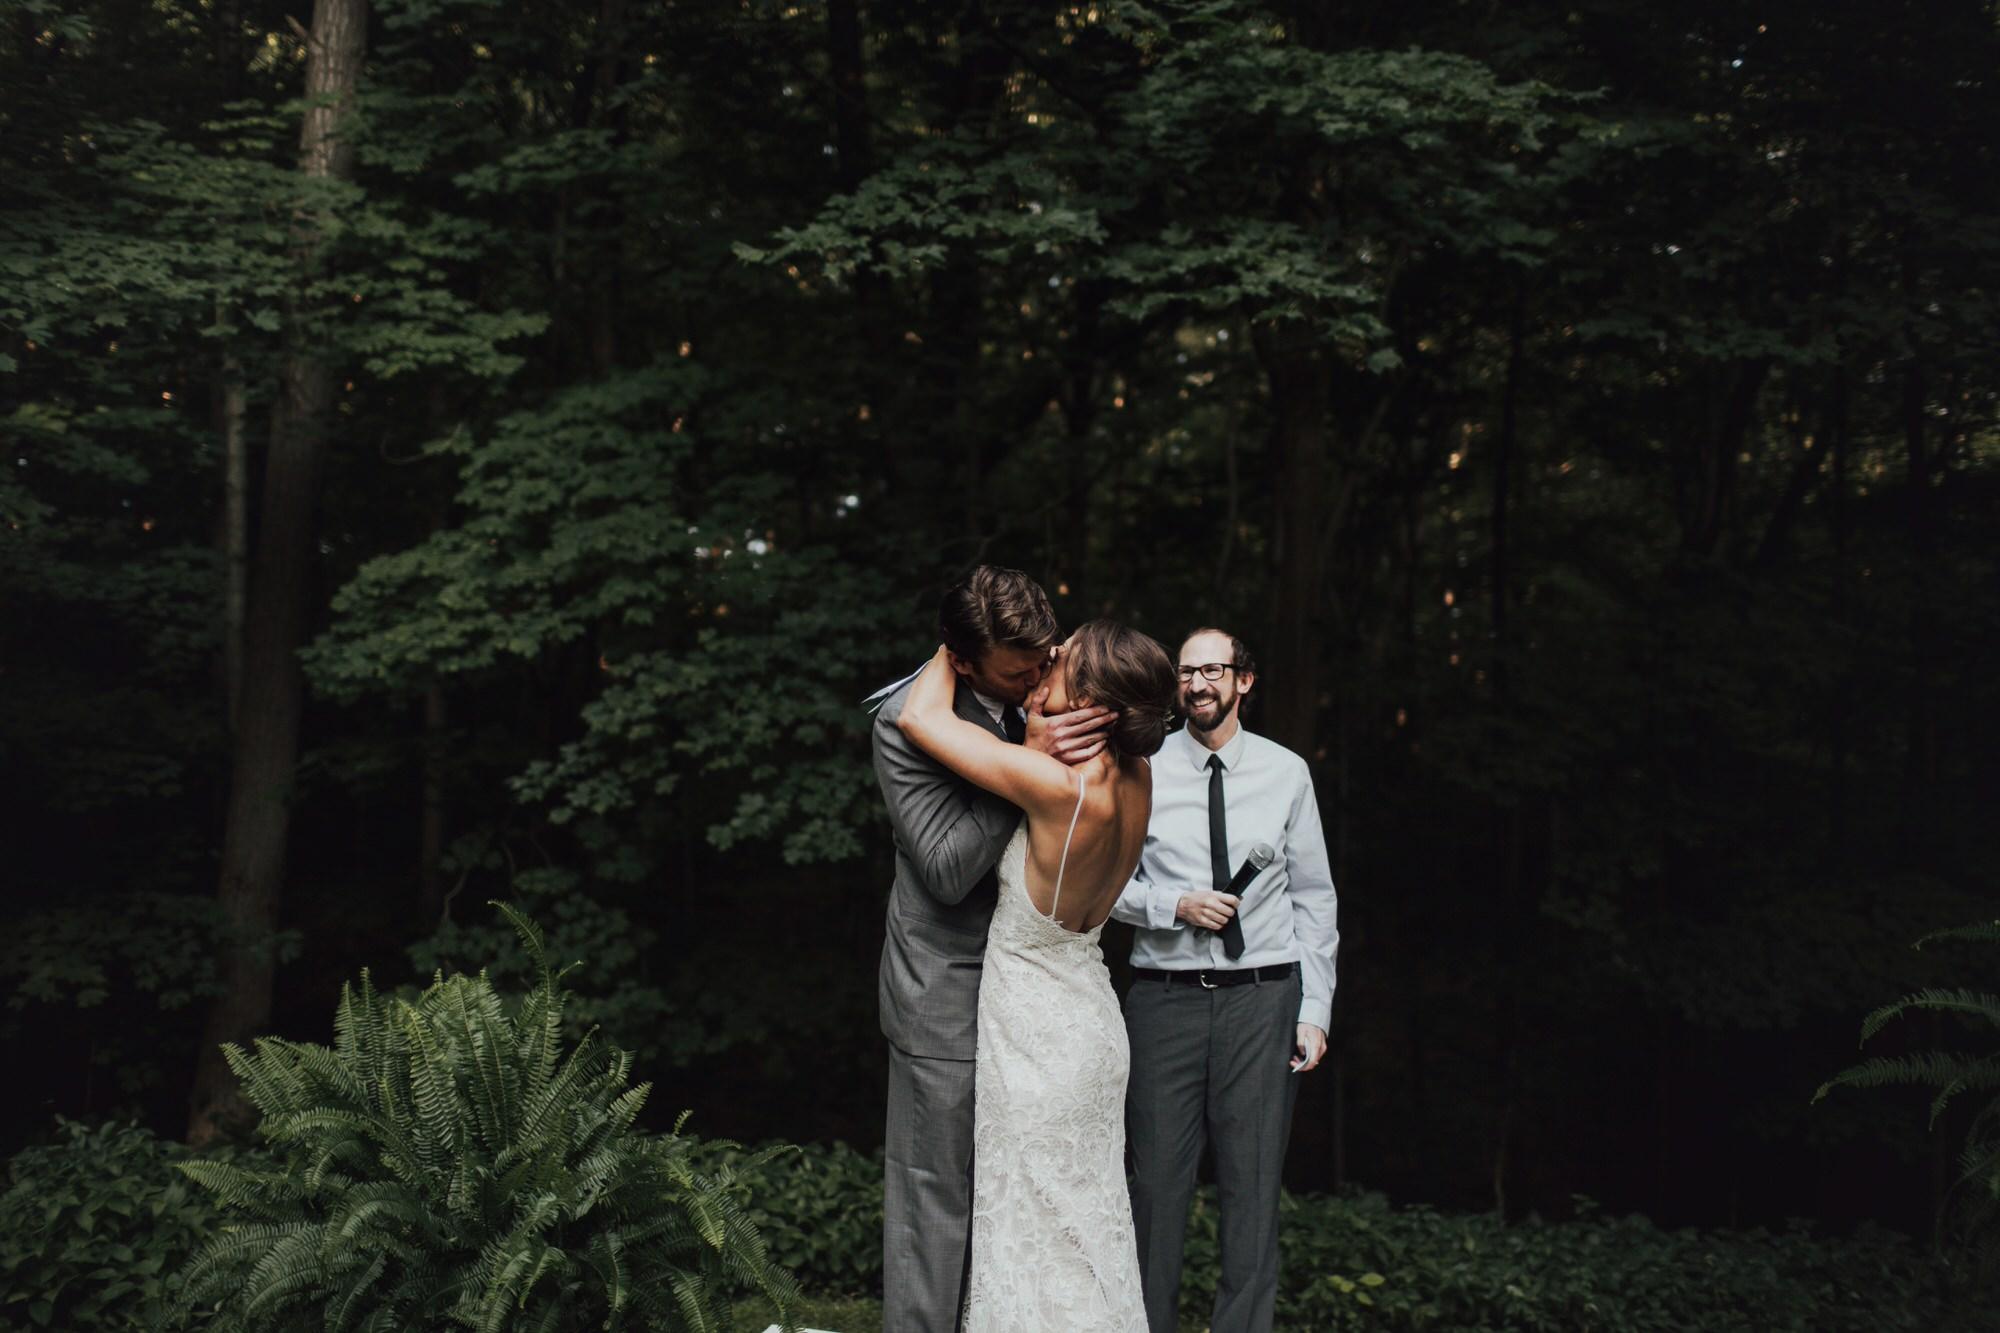 emily-aaron-rochester-new-york-wedding-photographer-76.JPG